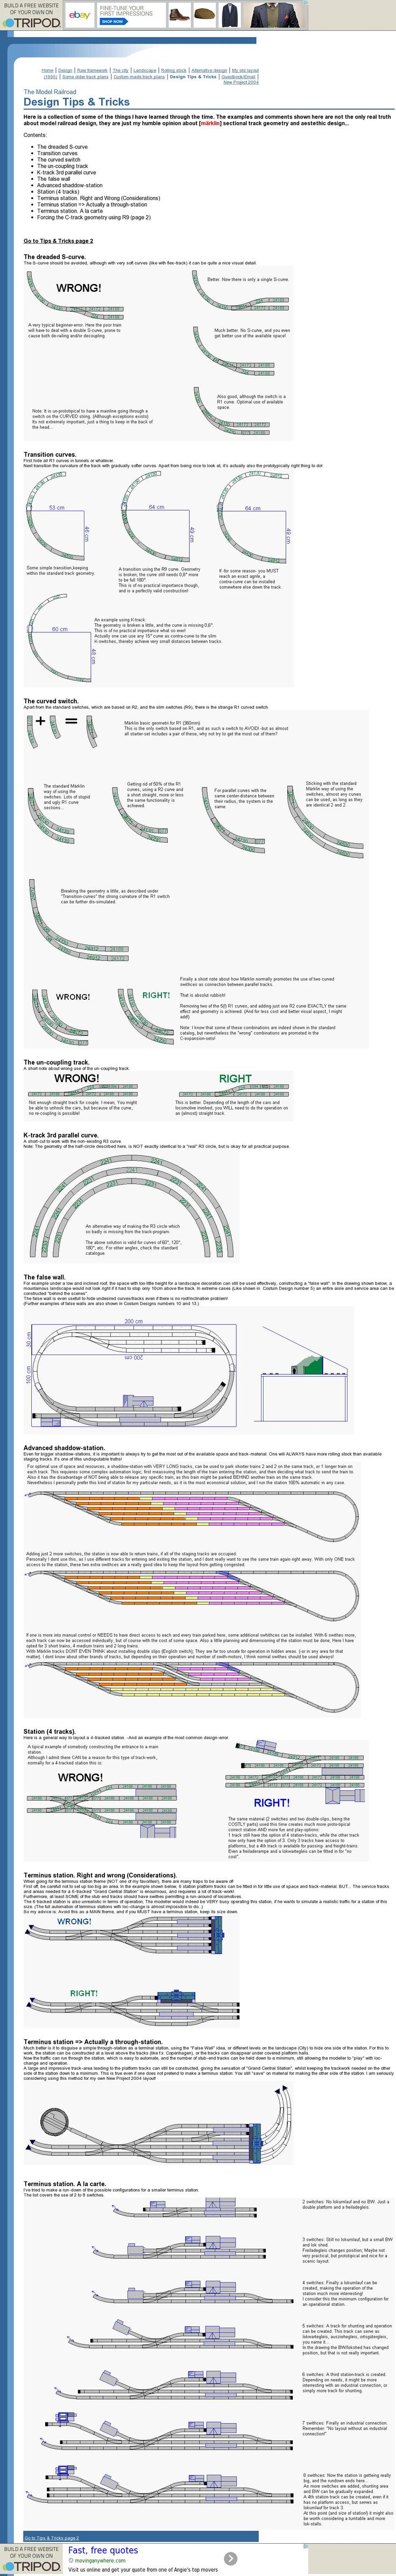 The website 'http://hoexbroe.tripod.com/train/id36.html' courtesy of @Pinstamatic (http://pinstamatic.com)